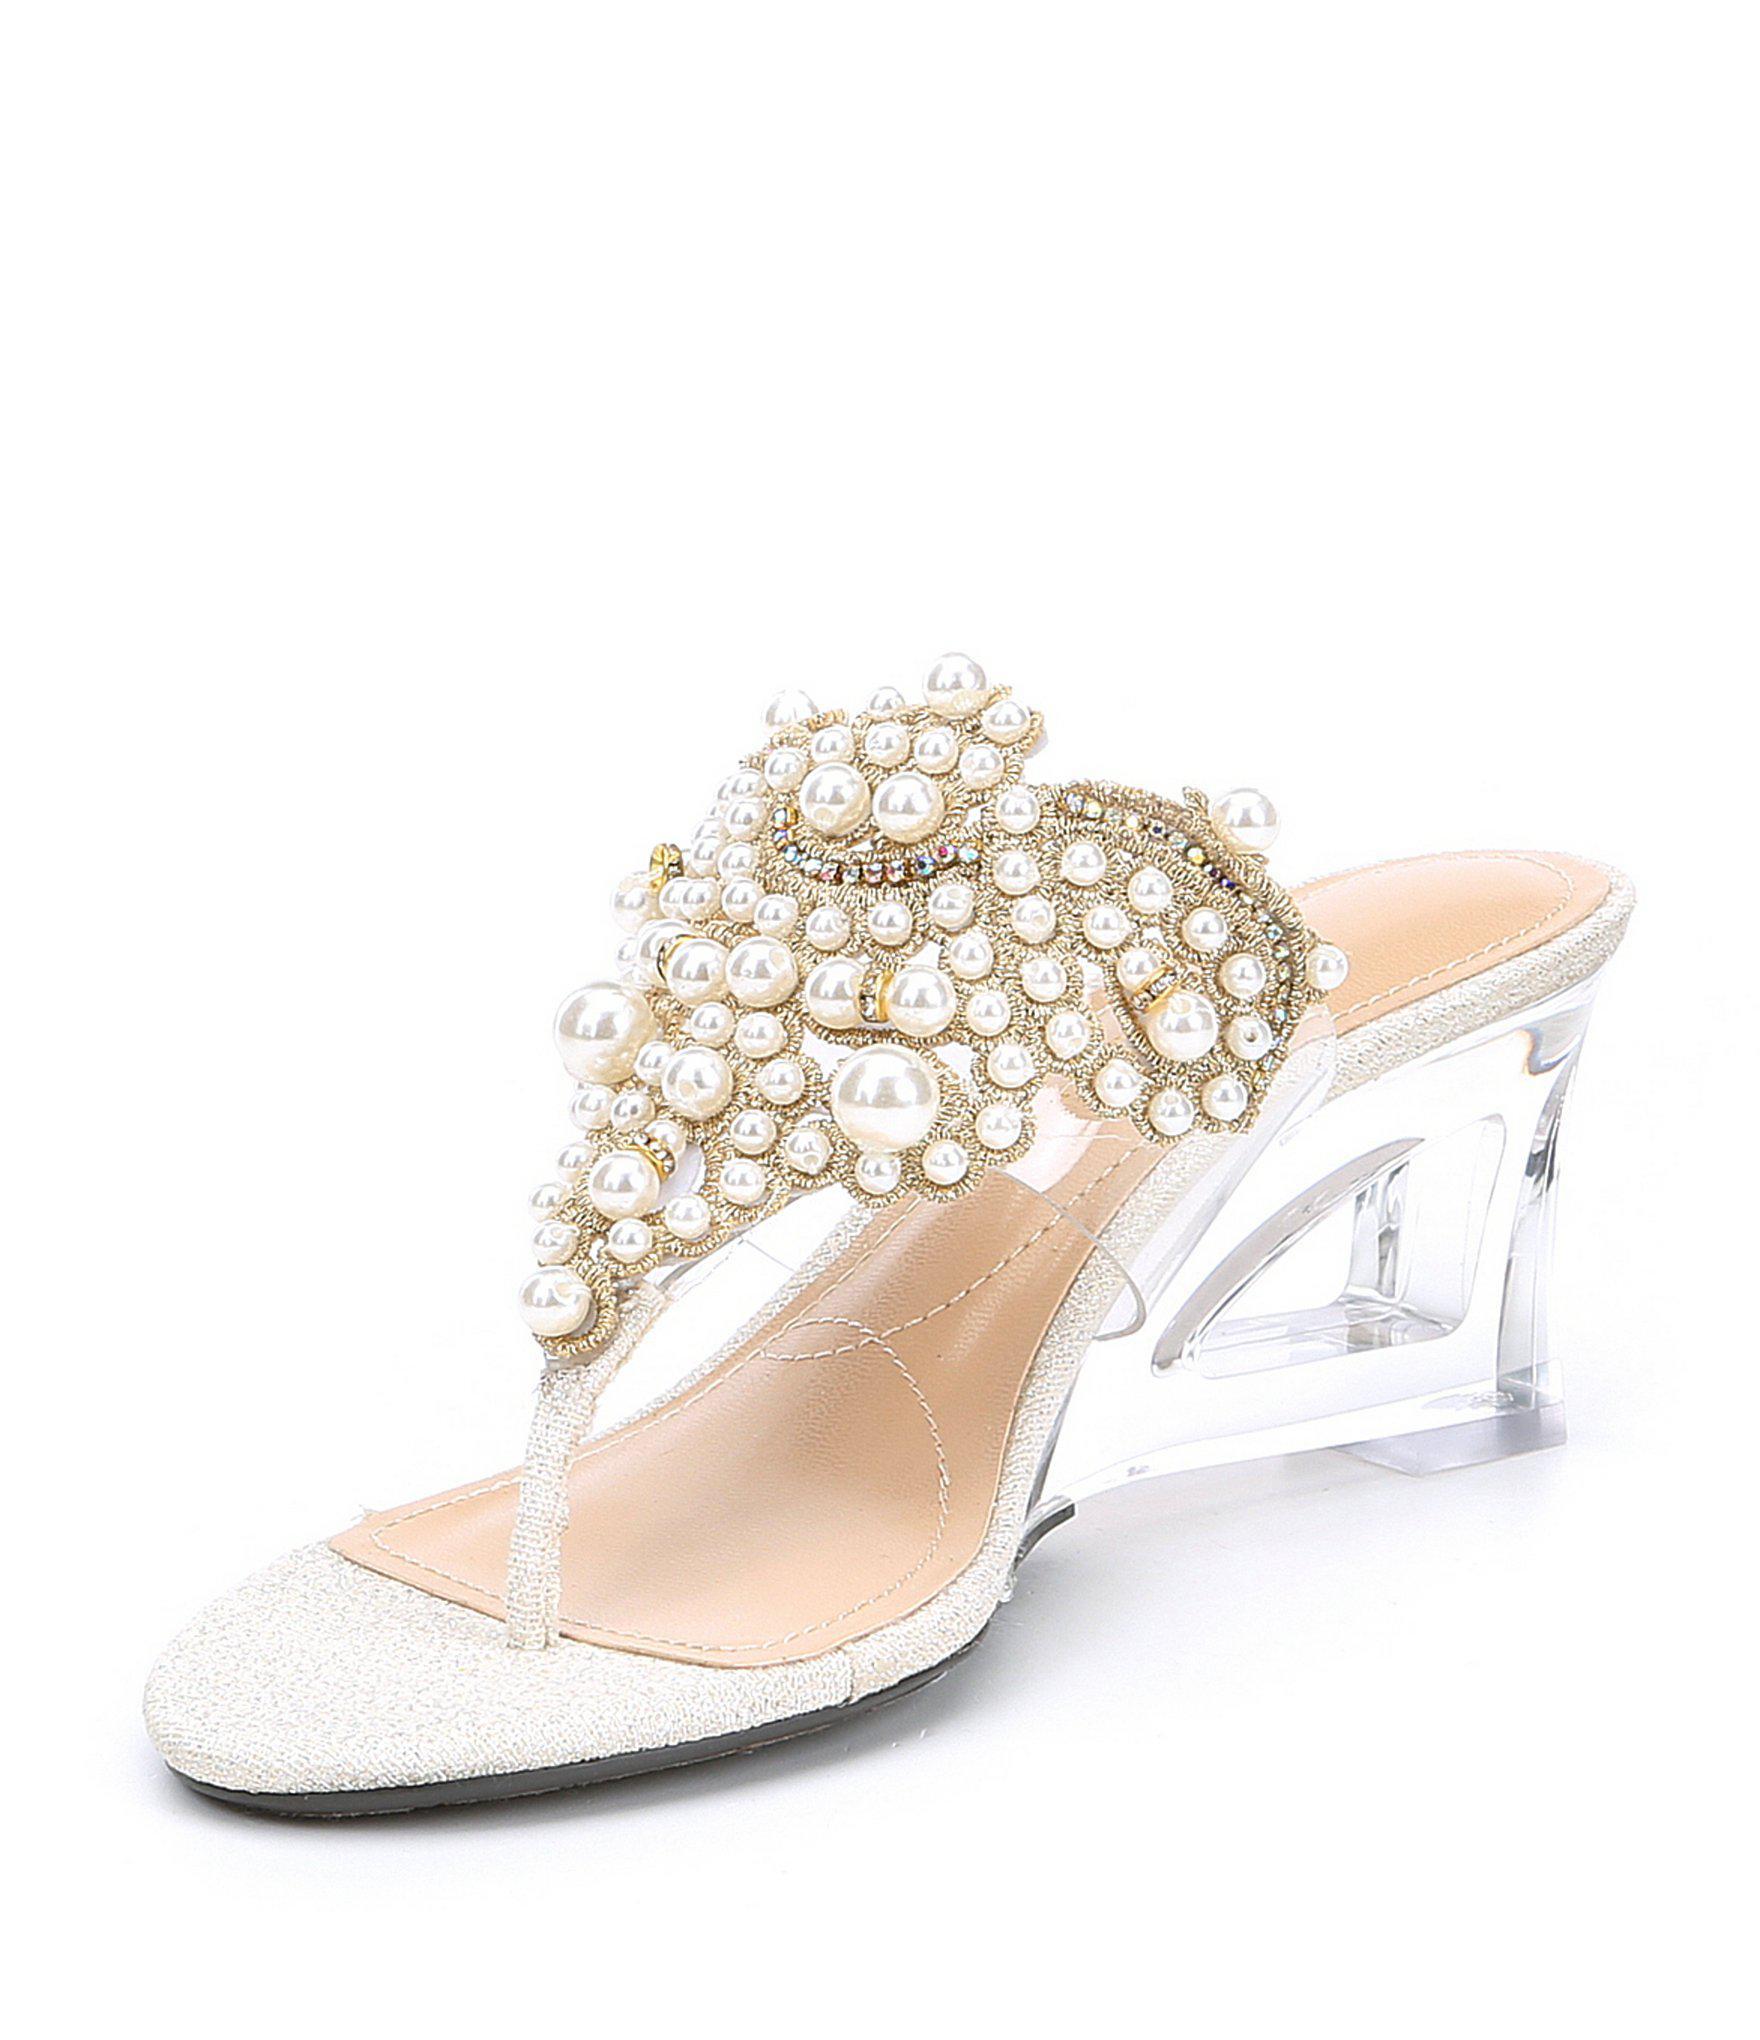 4e22adcd6c4c Lyst - J. Reneé Victorina Pearl Embellished Transparent Thong Dress ...